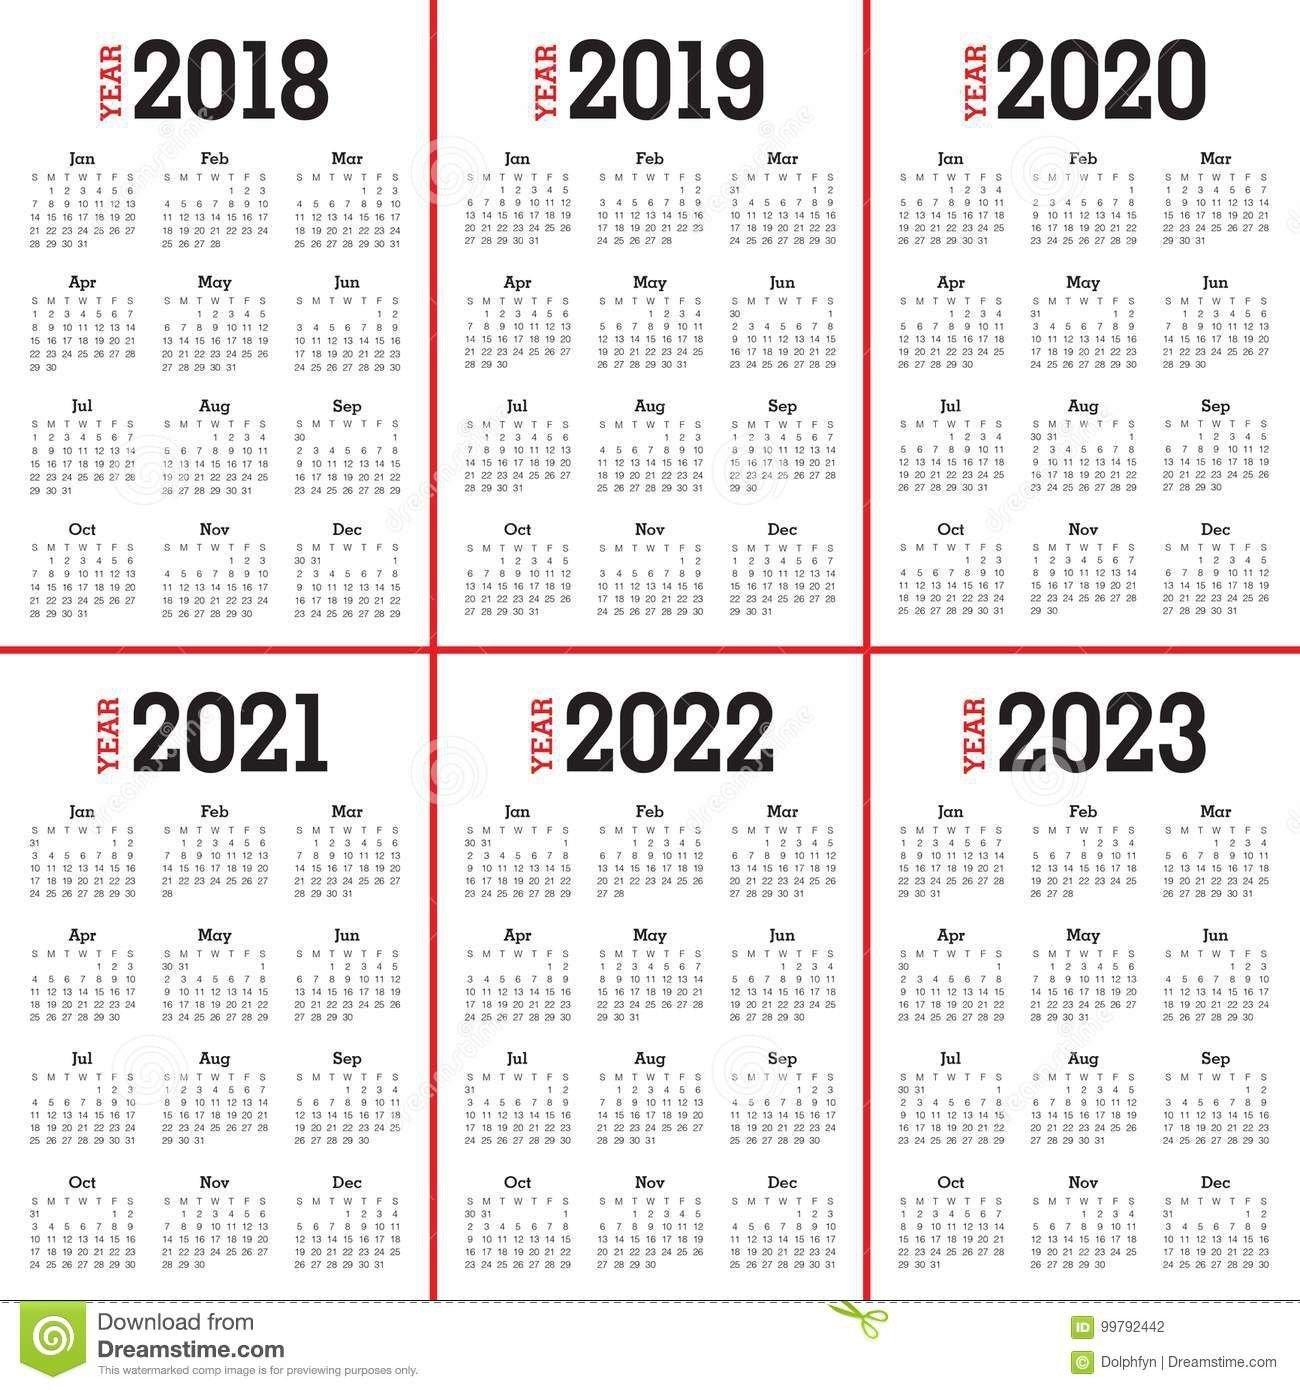 Free 5 Year Calendar Printable | Calendar Printables, Excel Printable 5 Year Calendar